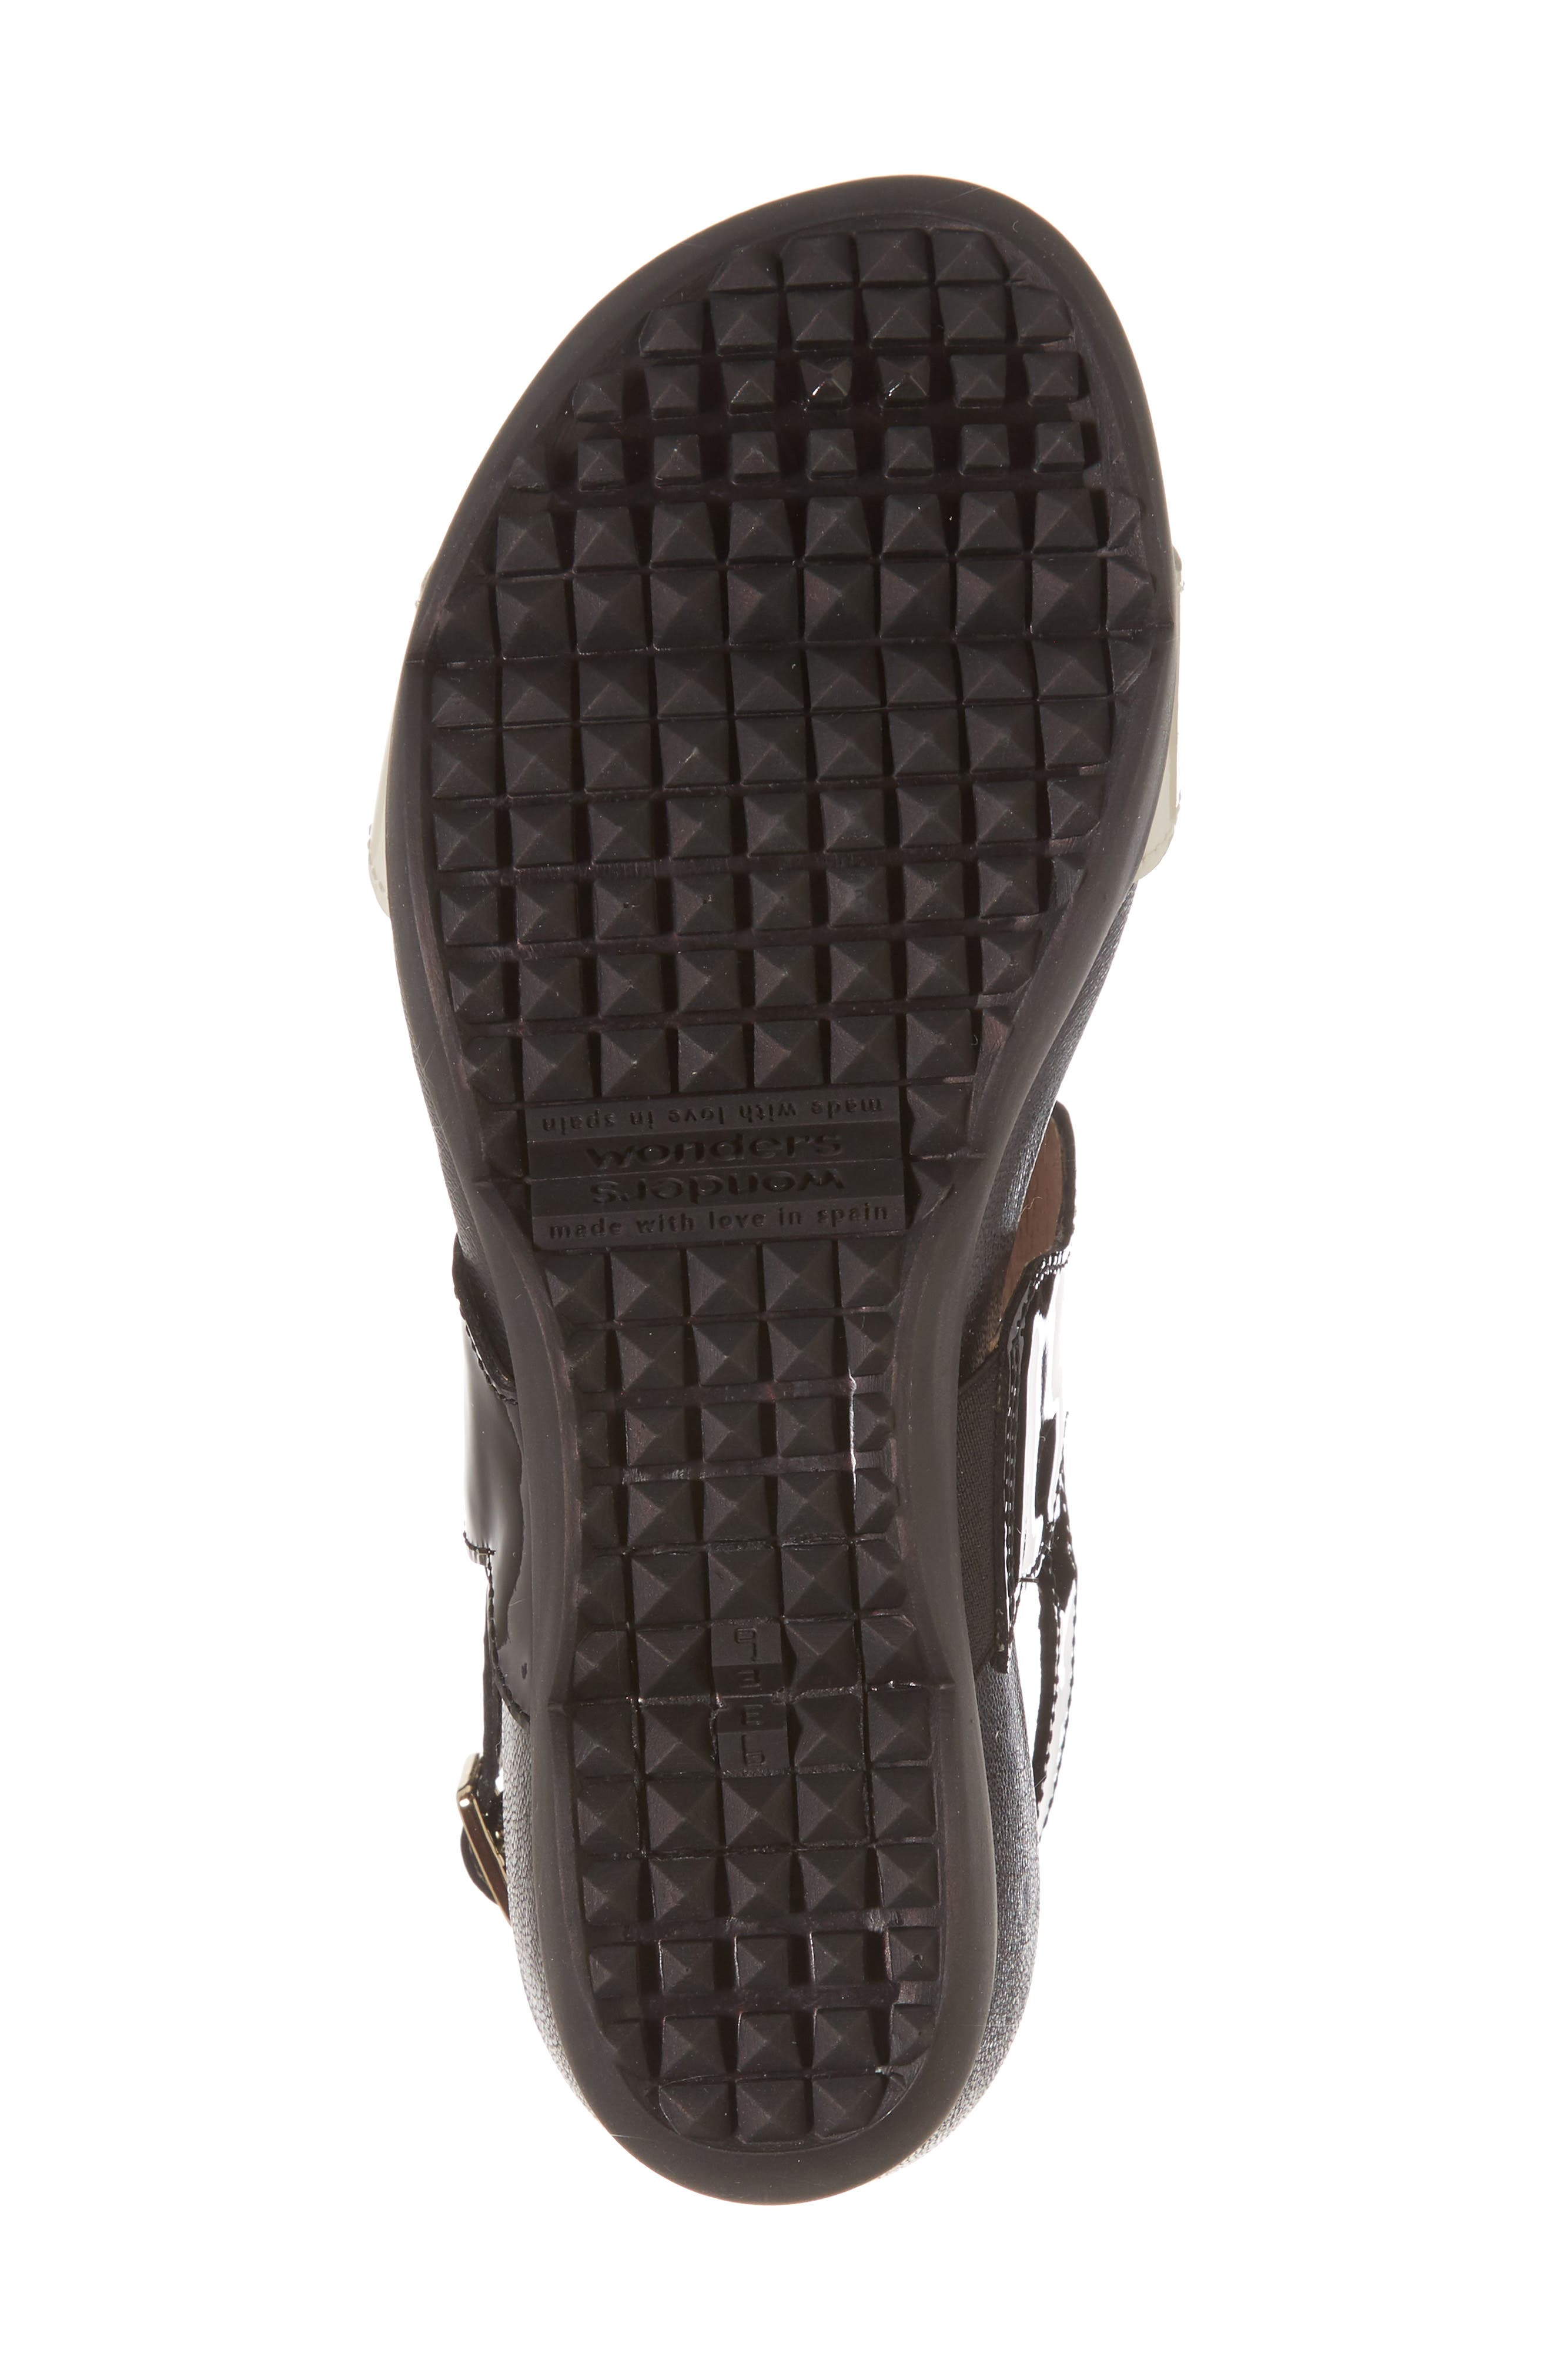 Wedge Sandal,                             Alternate thumbnail 6, color,                             Black/ Off Leather